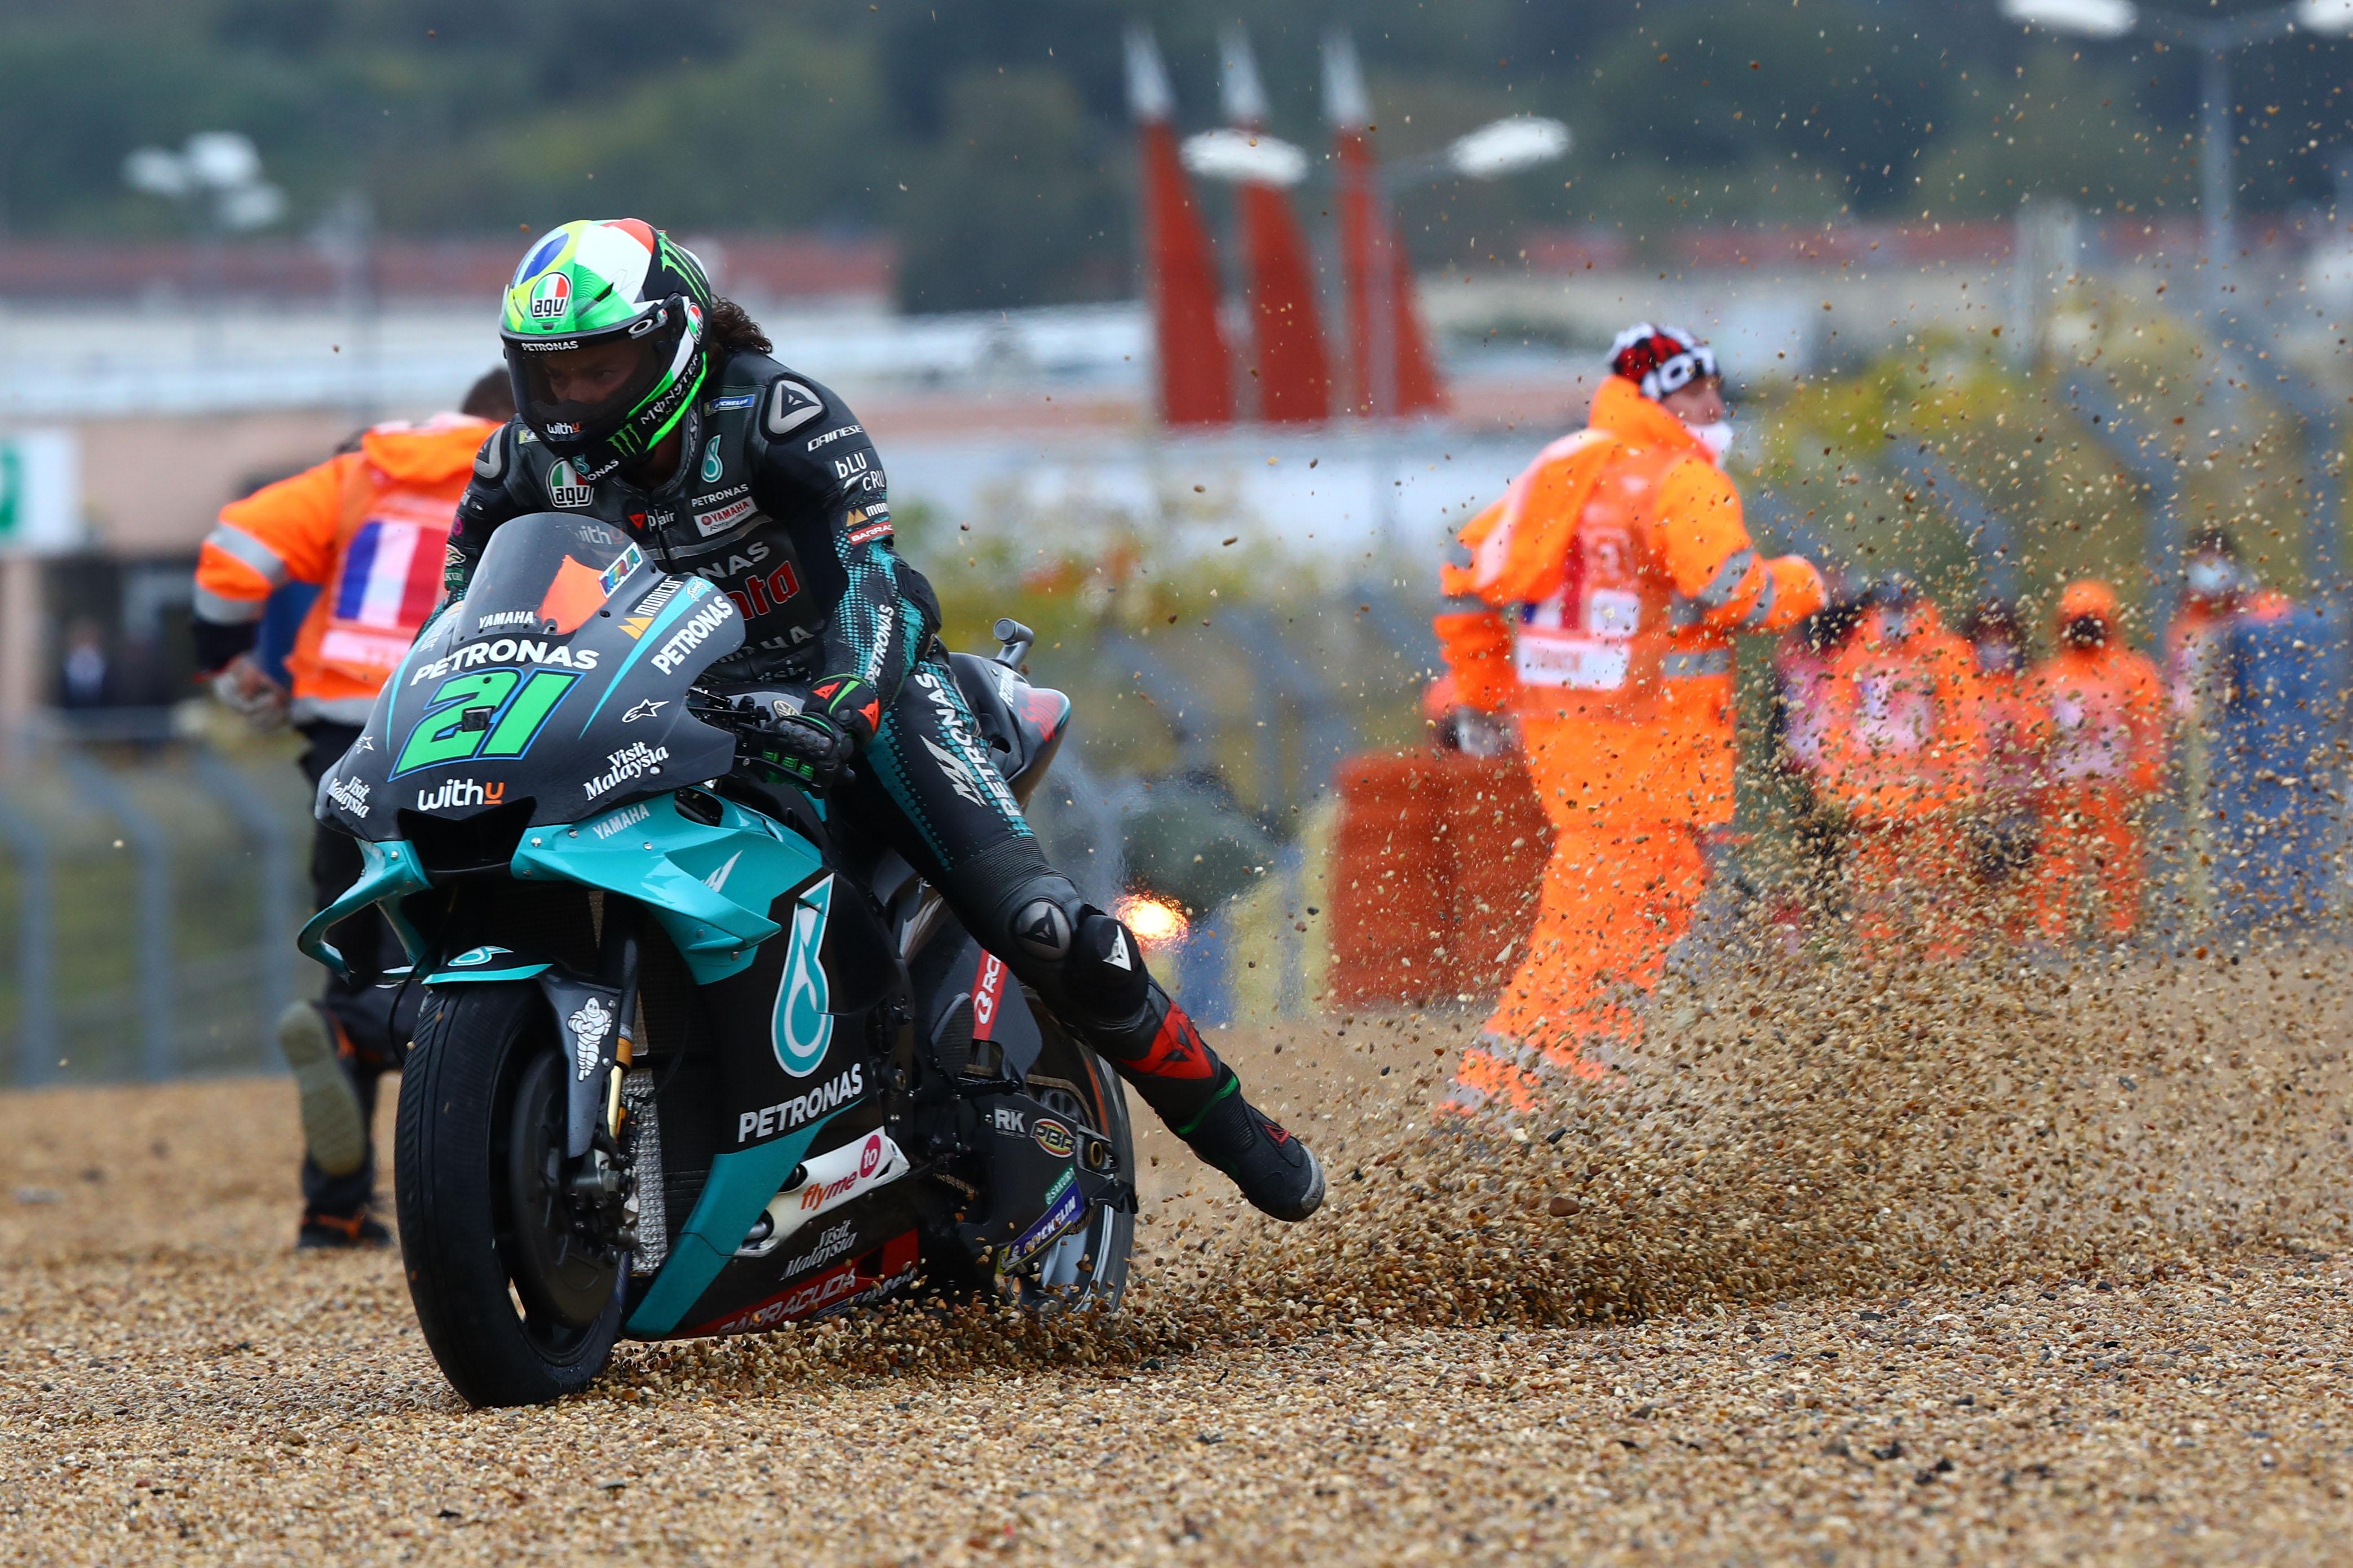 Franco Morbidelli Le Mans MotoGP 2020